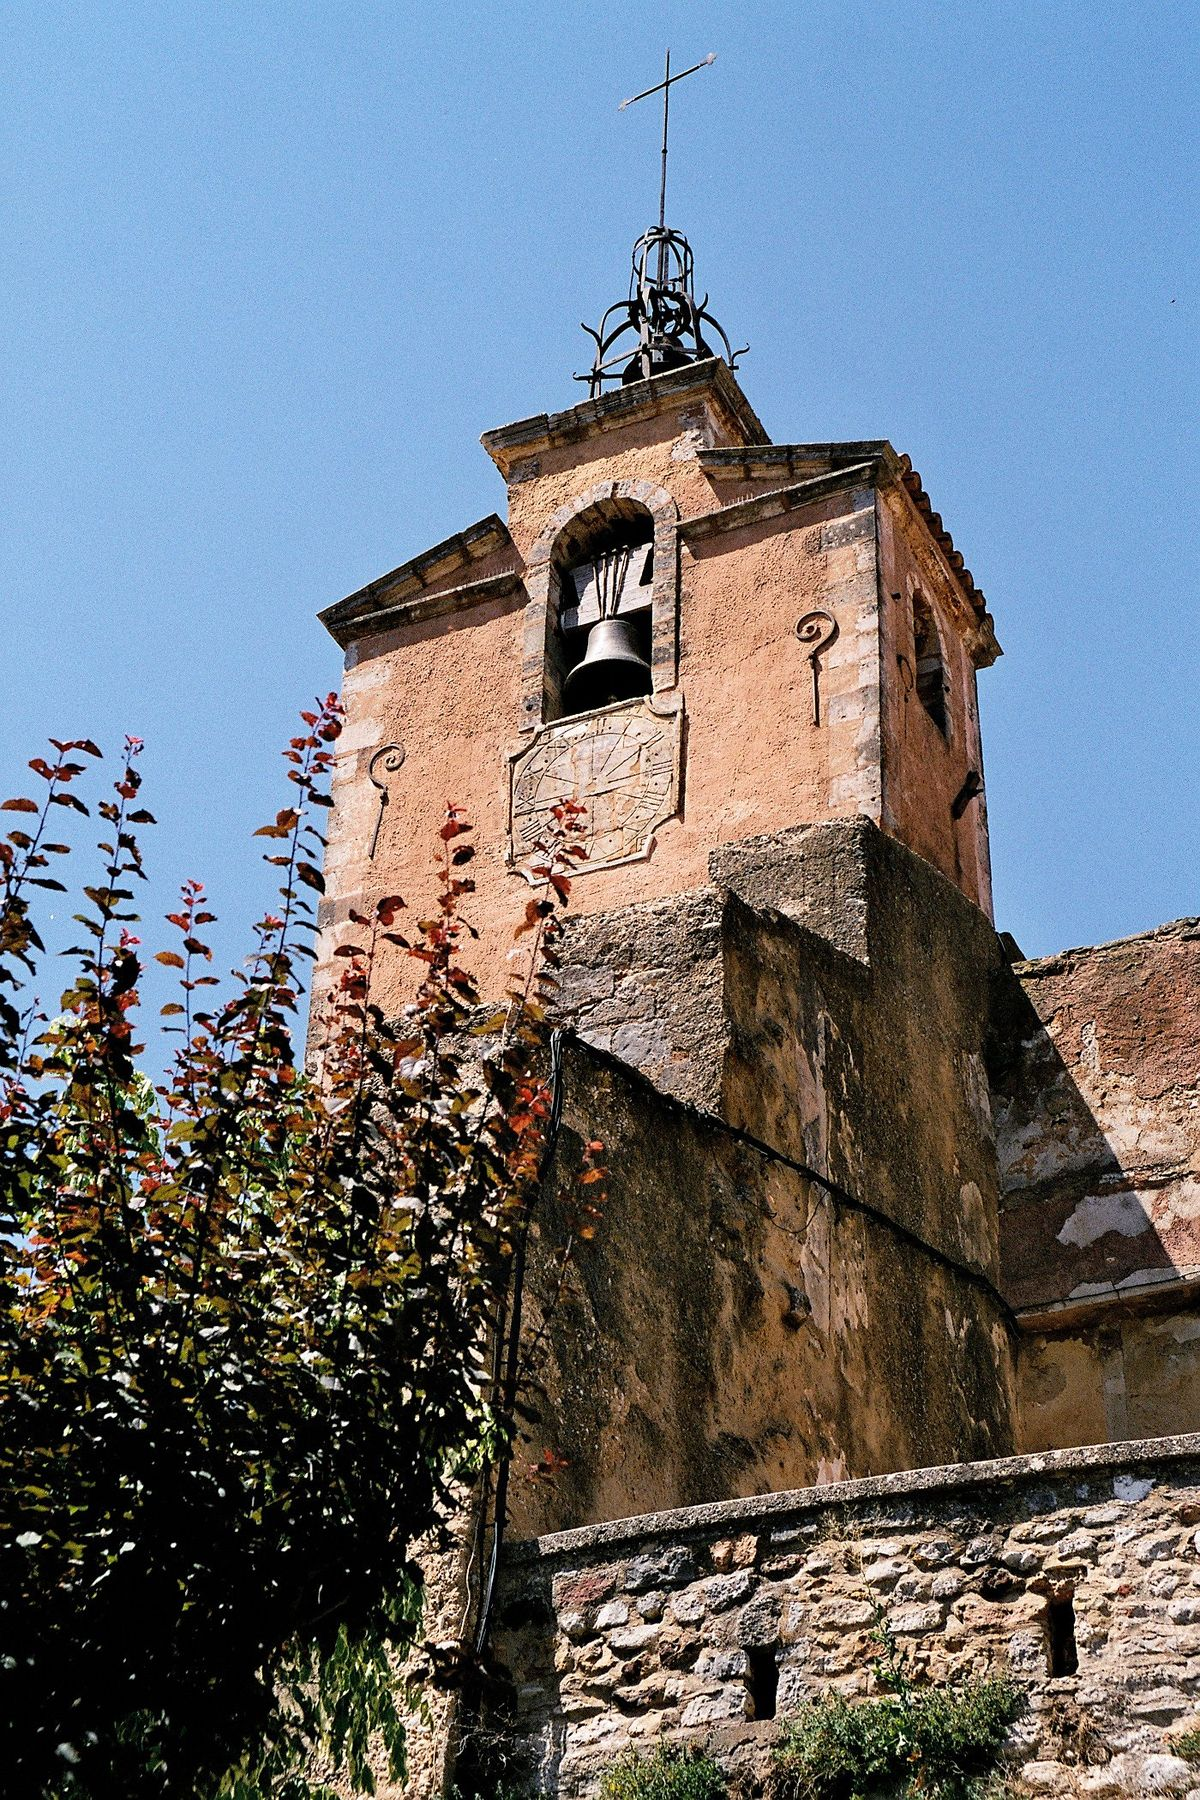 Issoire - Wikimedia Commons